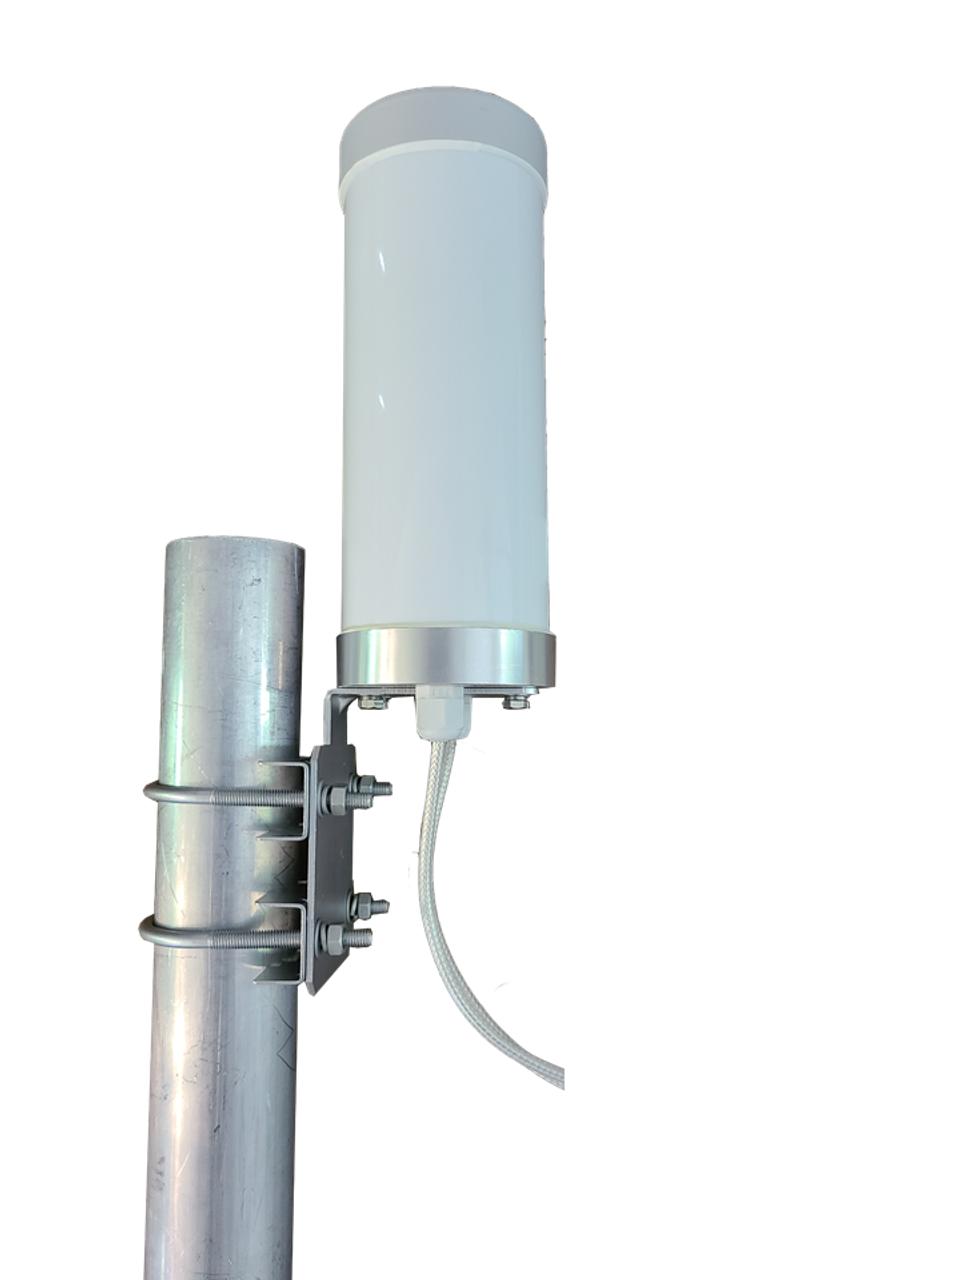 M29T T-Mobile (Band 71 Optimized) MIMO 2 x Cellular 4G LTE CBRS 5G M2M IoT Bracket Mount Antenna - Pole Mount